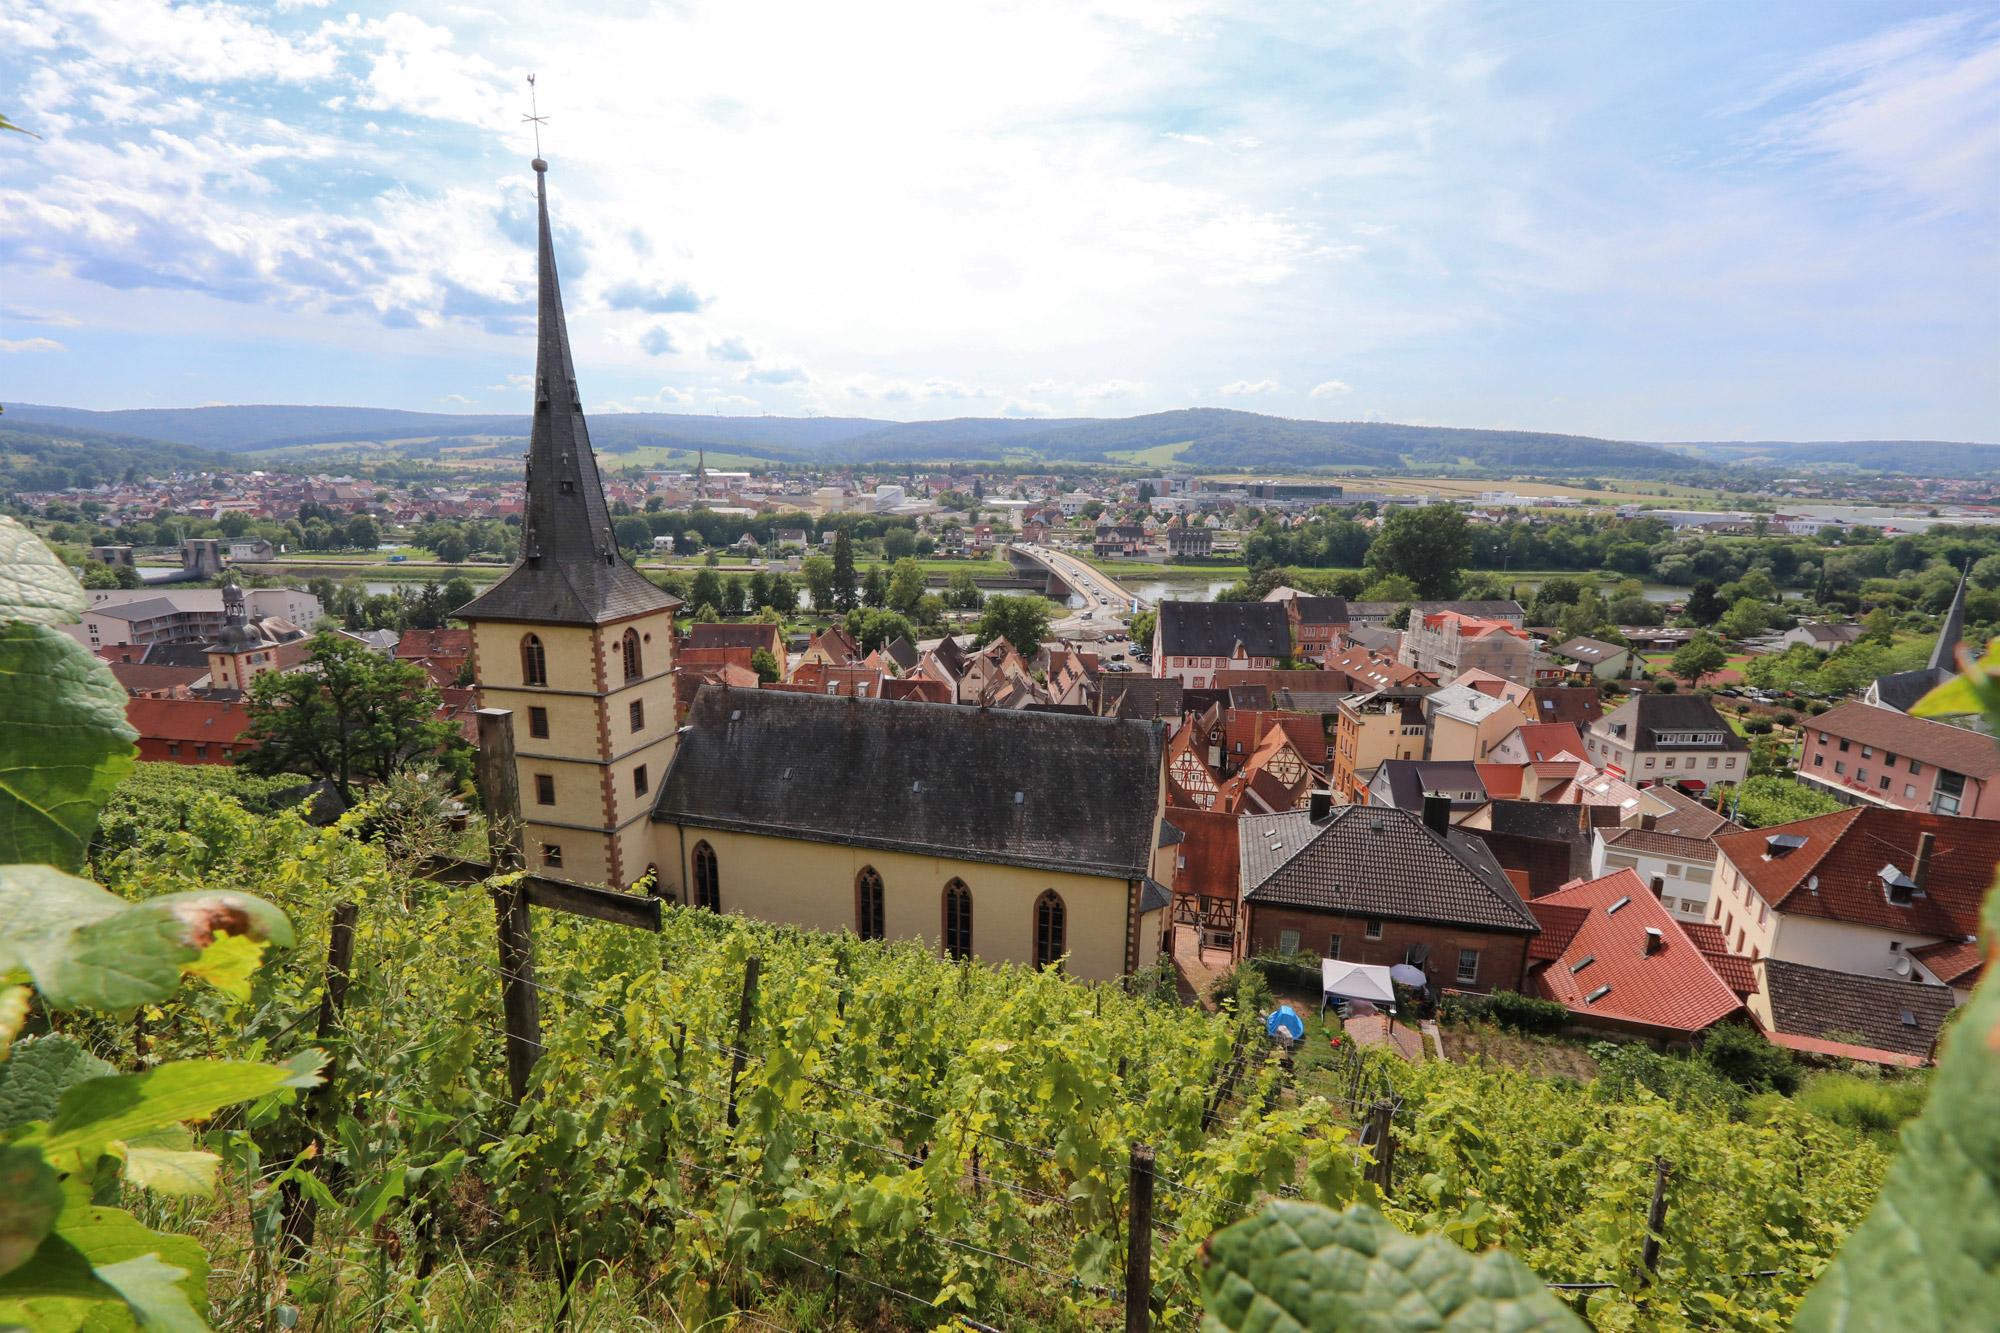 Churfranken - Klingenberg